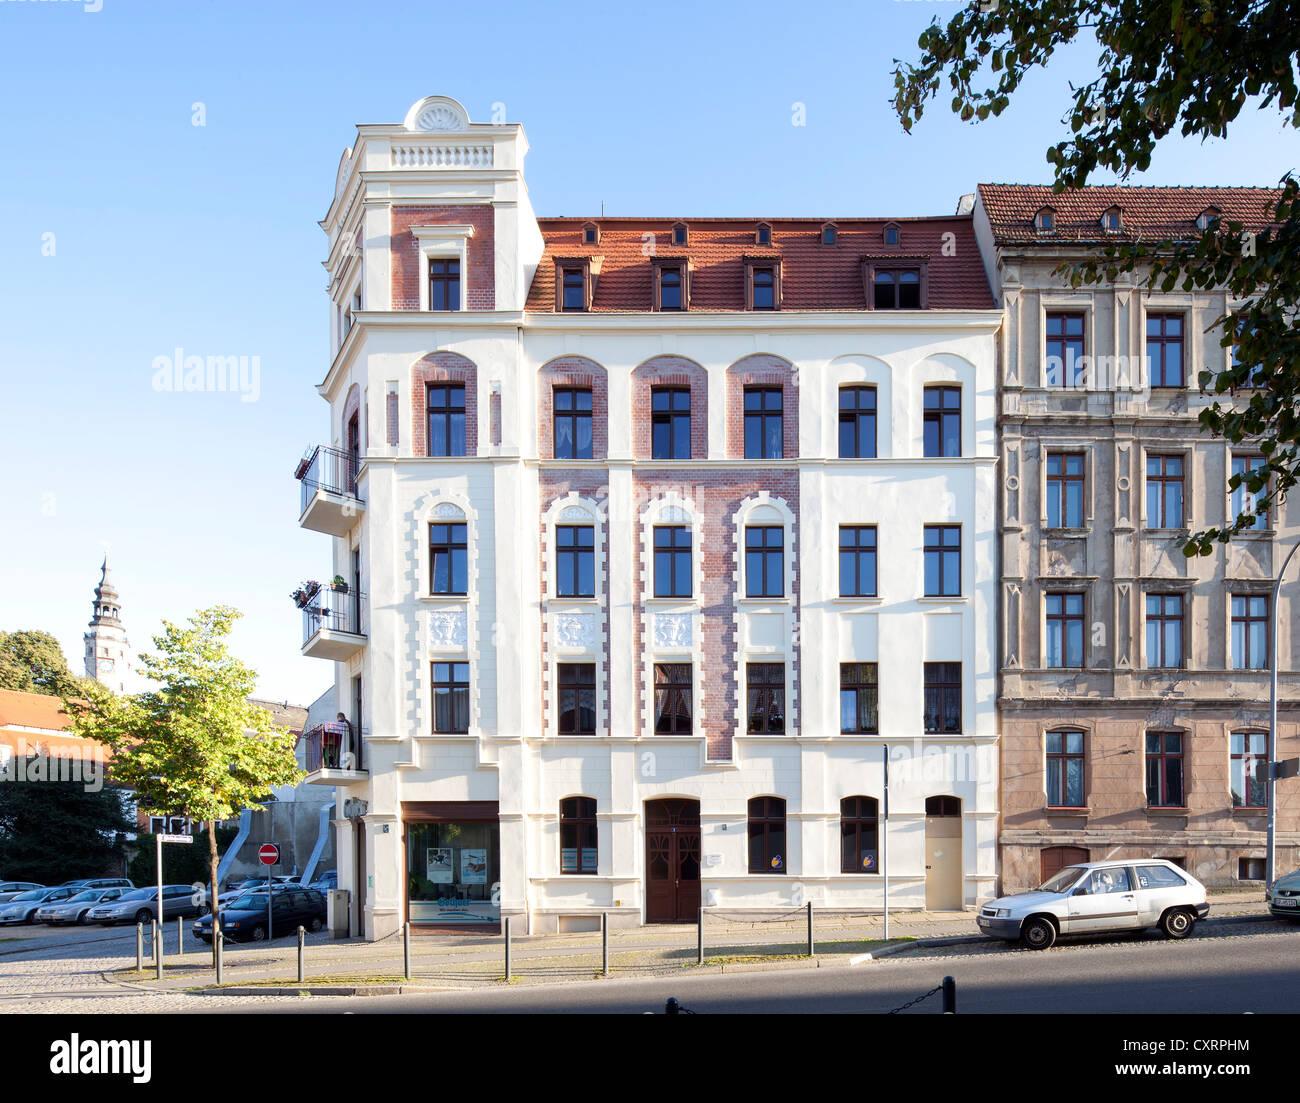 Refurbished residential building, apartment house, Gruenderzeit period, Goerlitz, Upper Lusatia, Lusatia, Saxony, - Stock Image